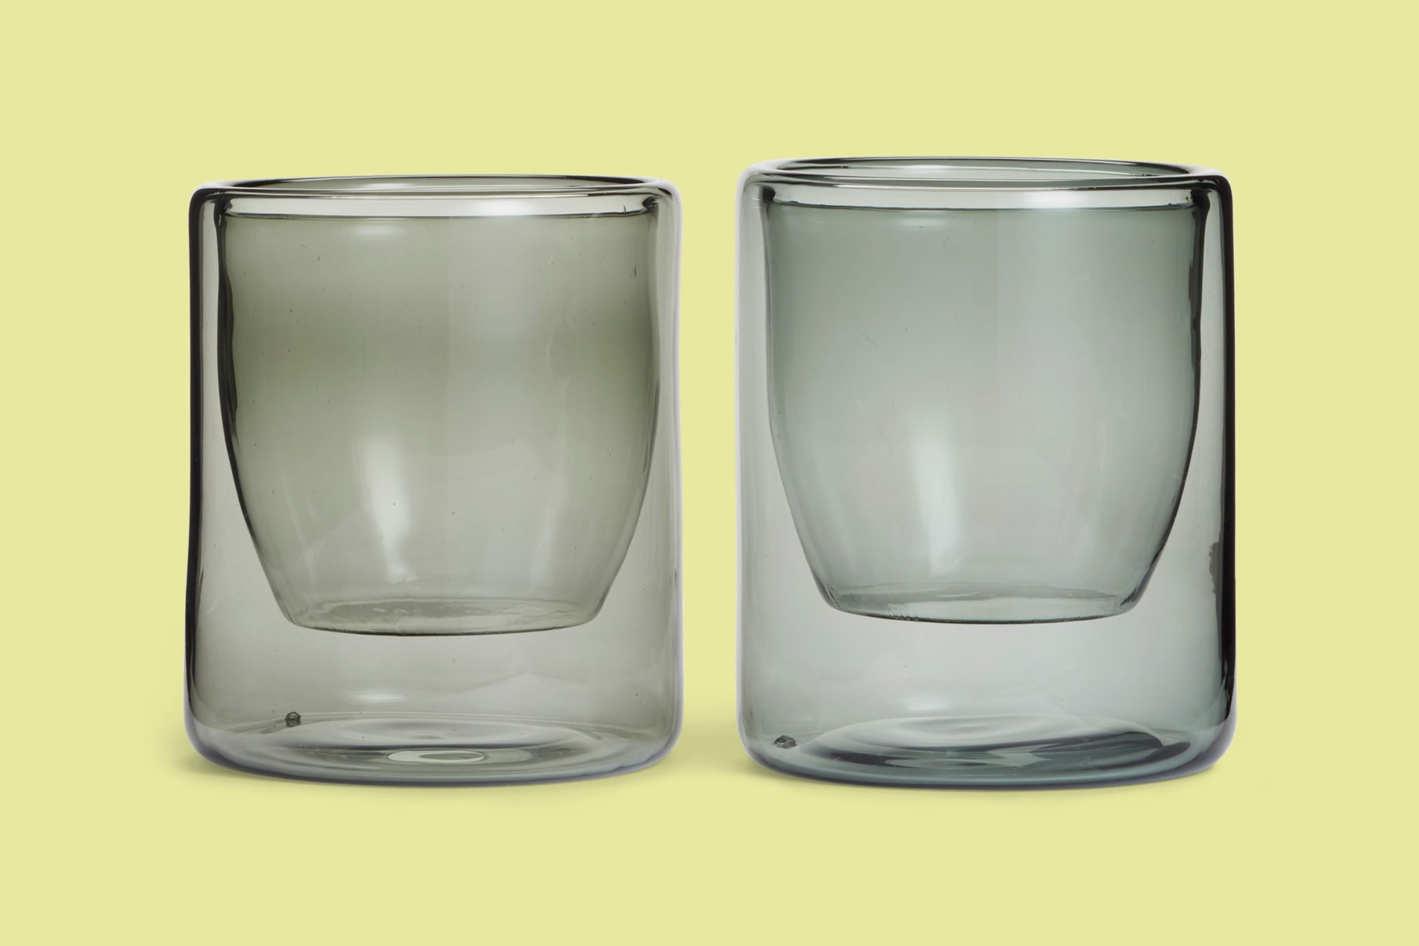 Yield Set of 2 Double-Wall Borosilicate Glasses